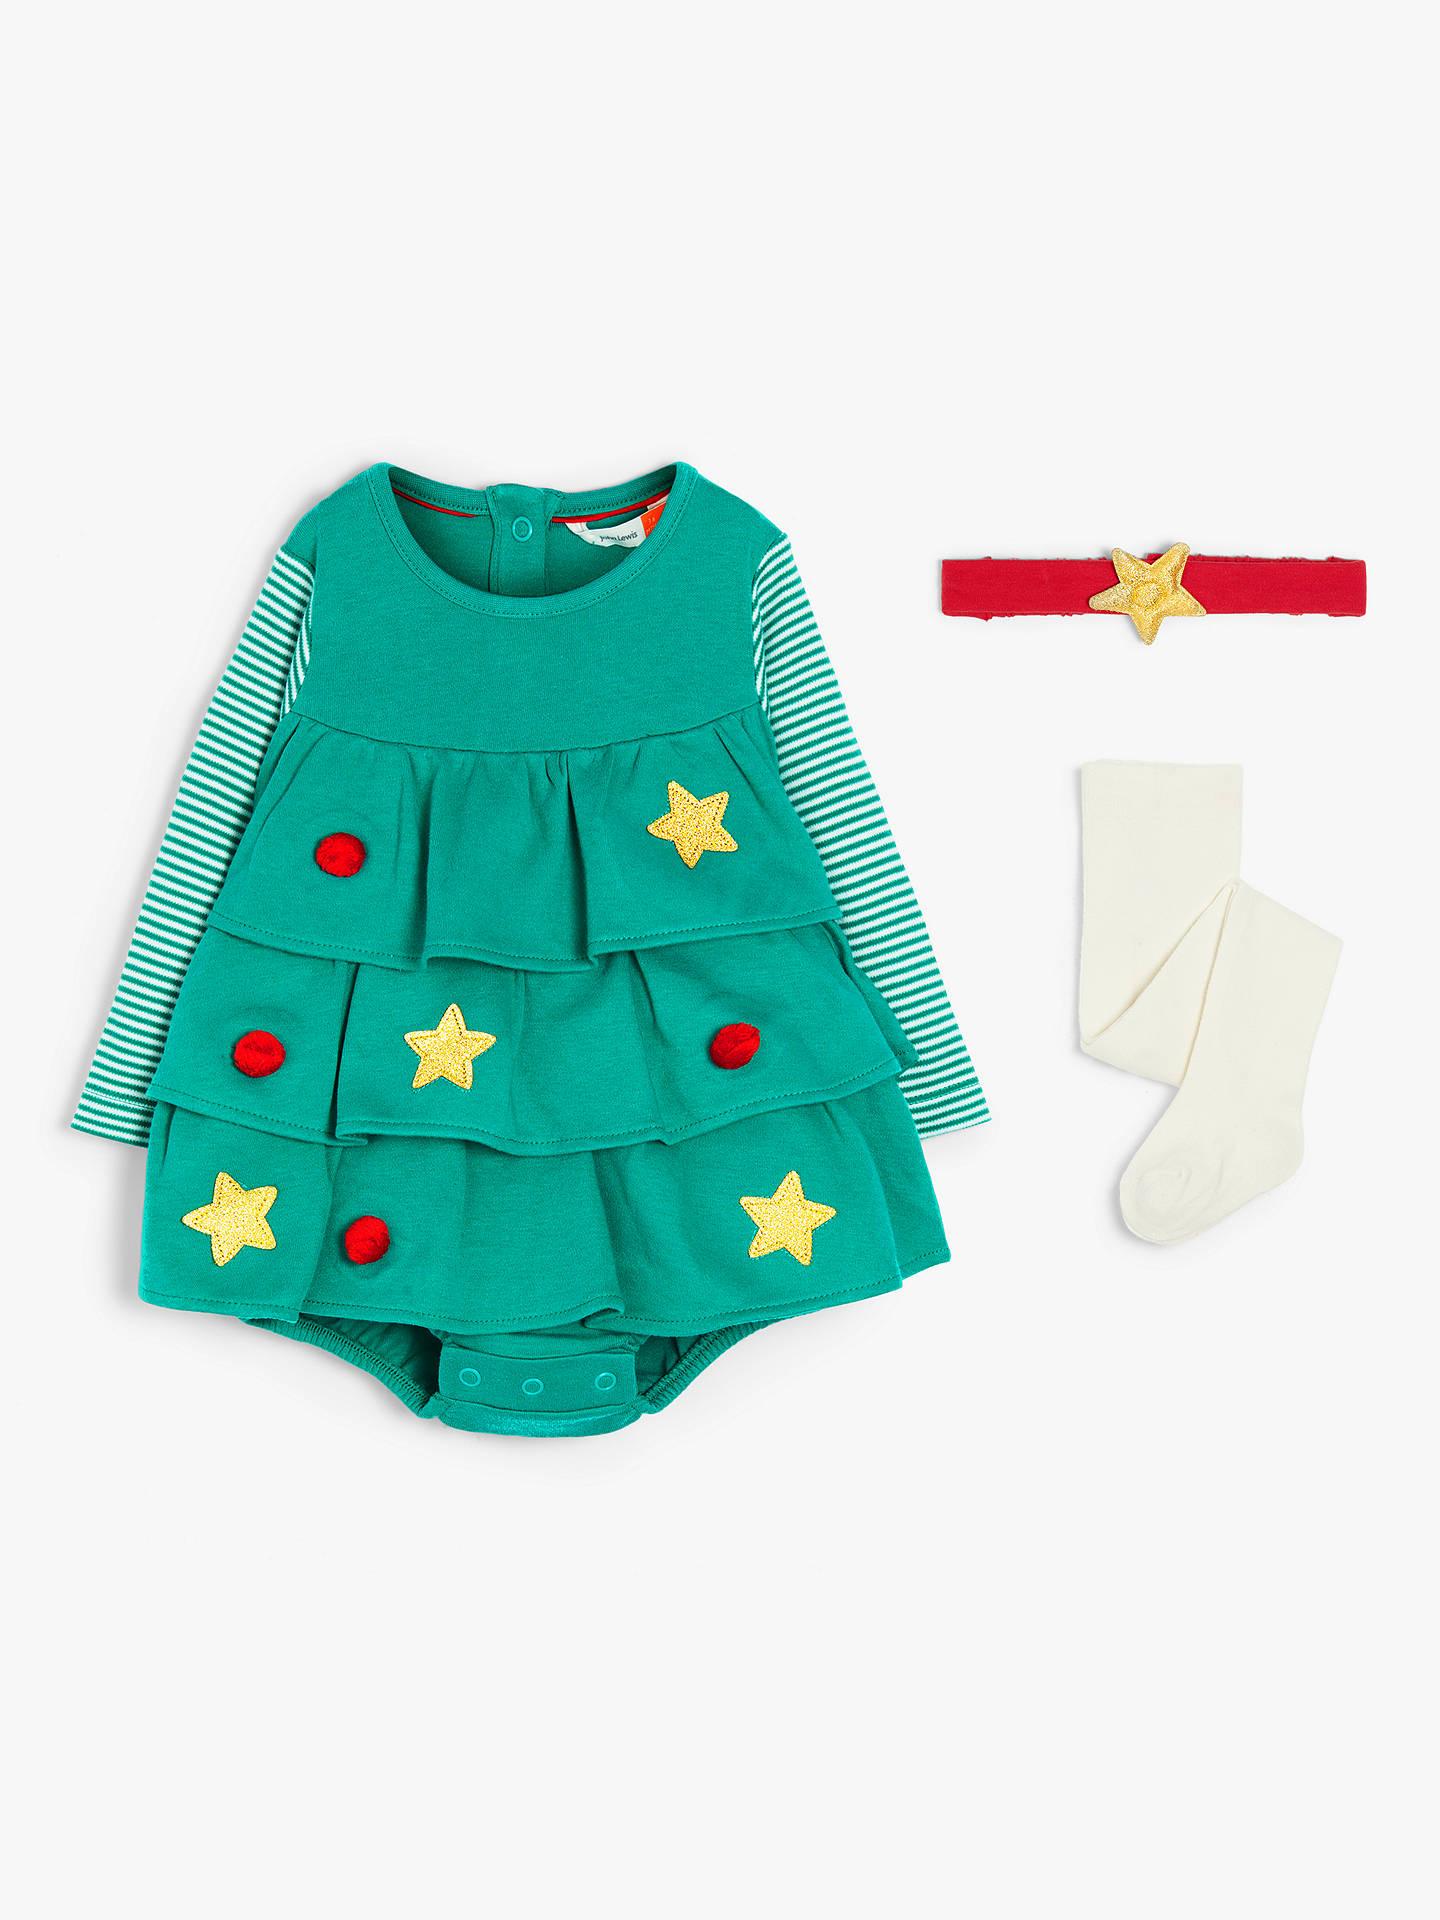 Toddler Christmas Tree.John Lewis Partners Baby Gots Organic Cotton Christmas Tree Romper And Headband Set Green